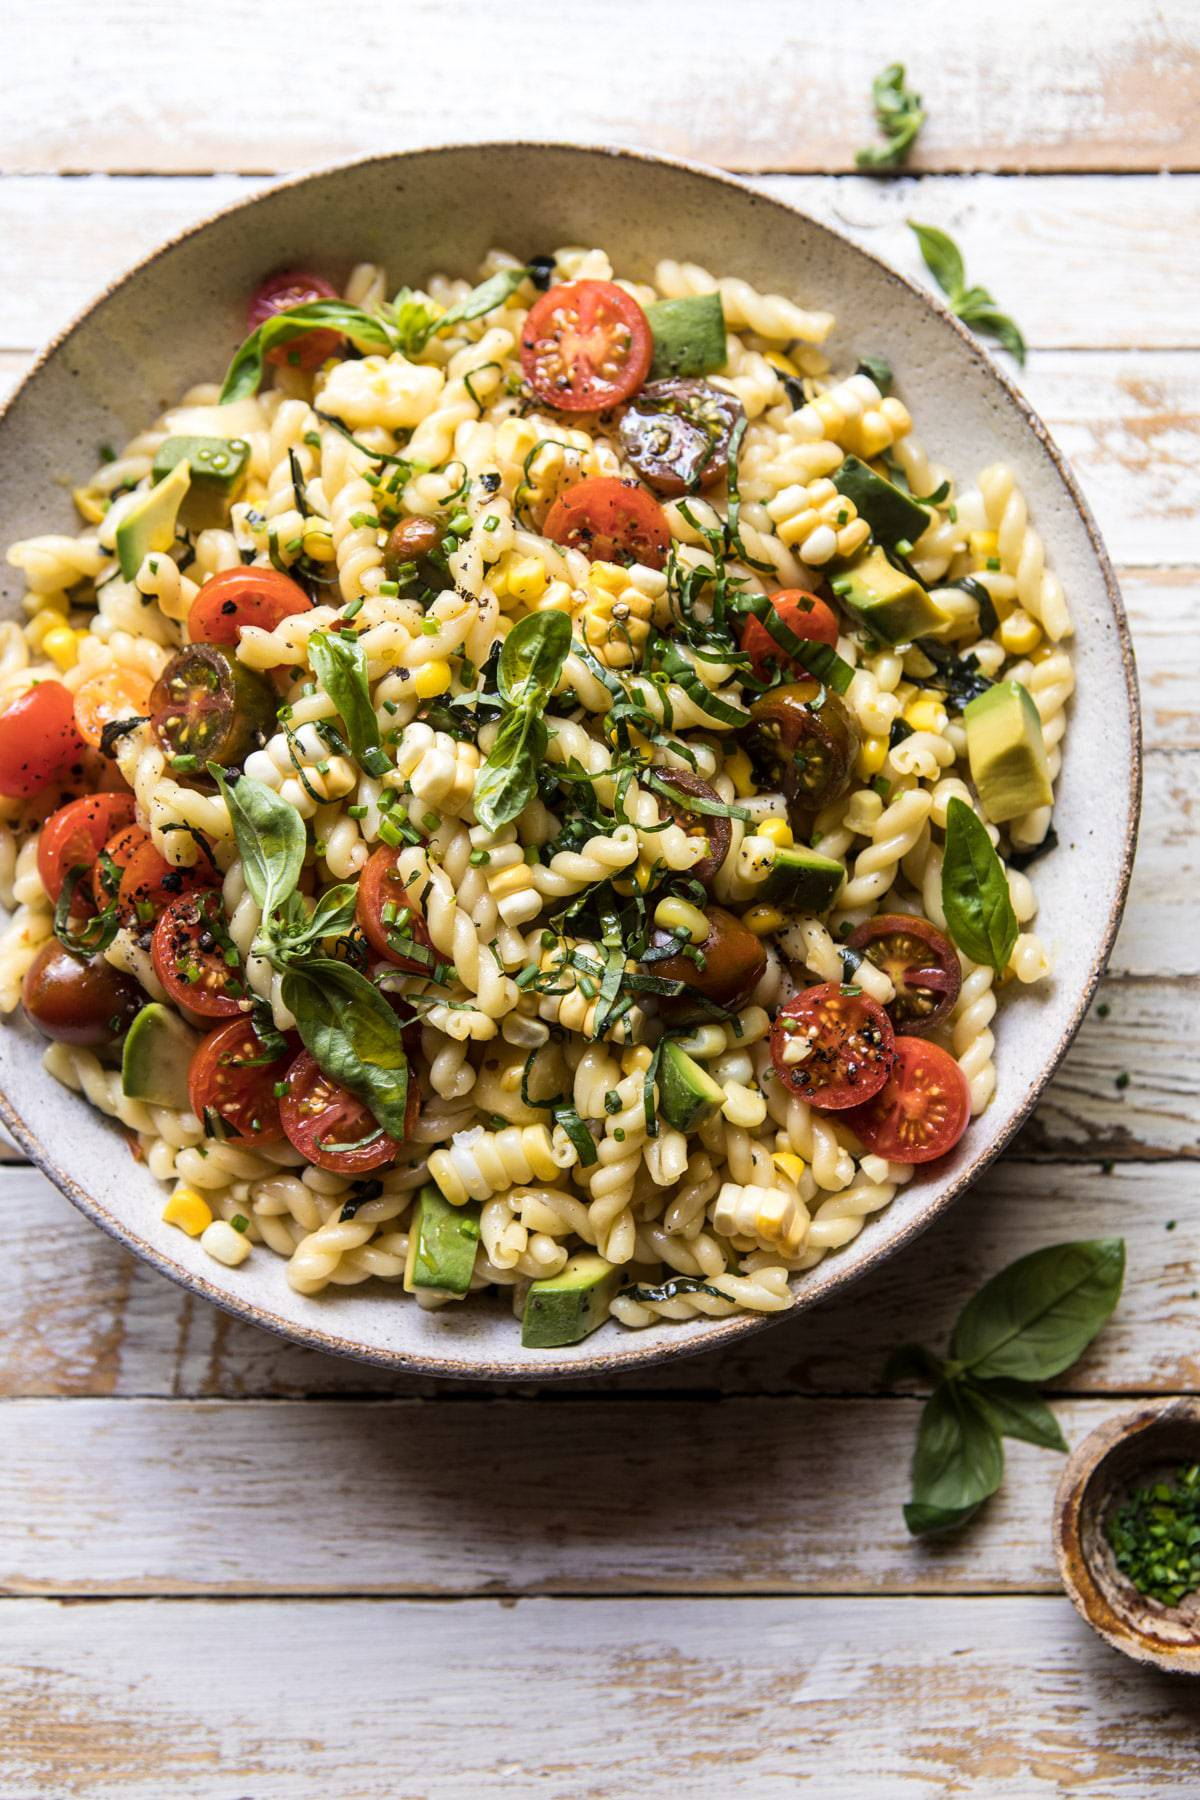 Corn Tomato And Avocado Pasta Salad Half Baked Harvest